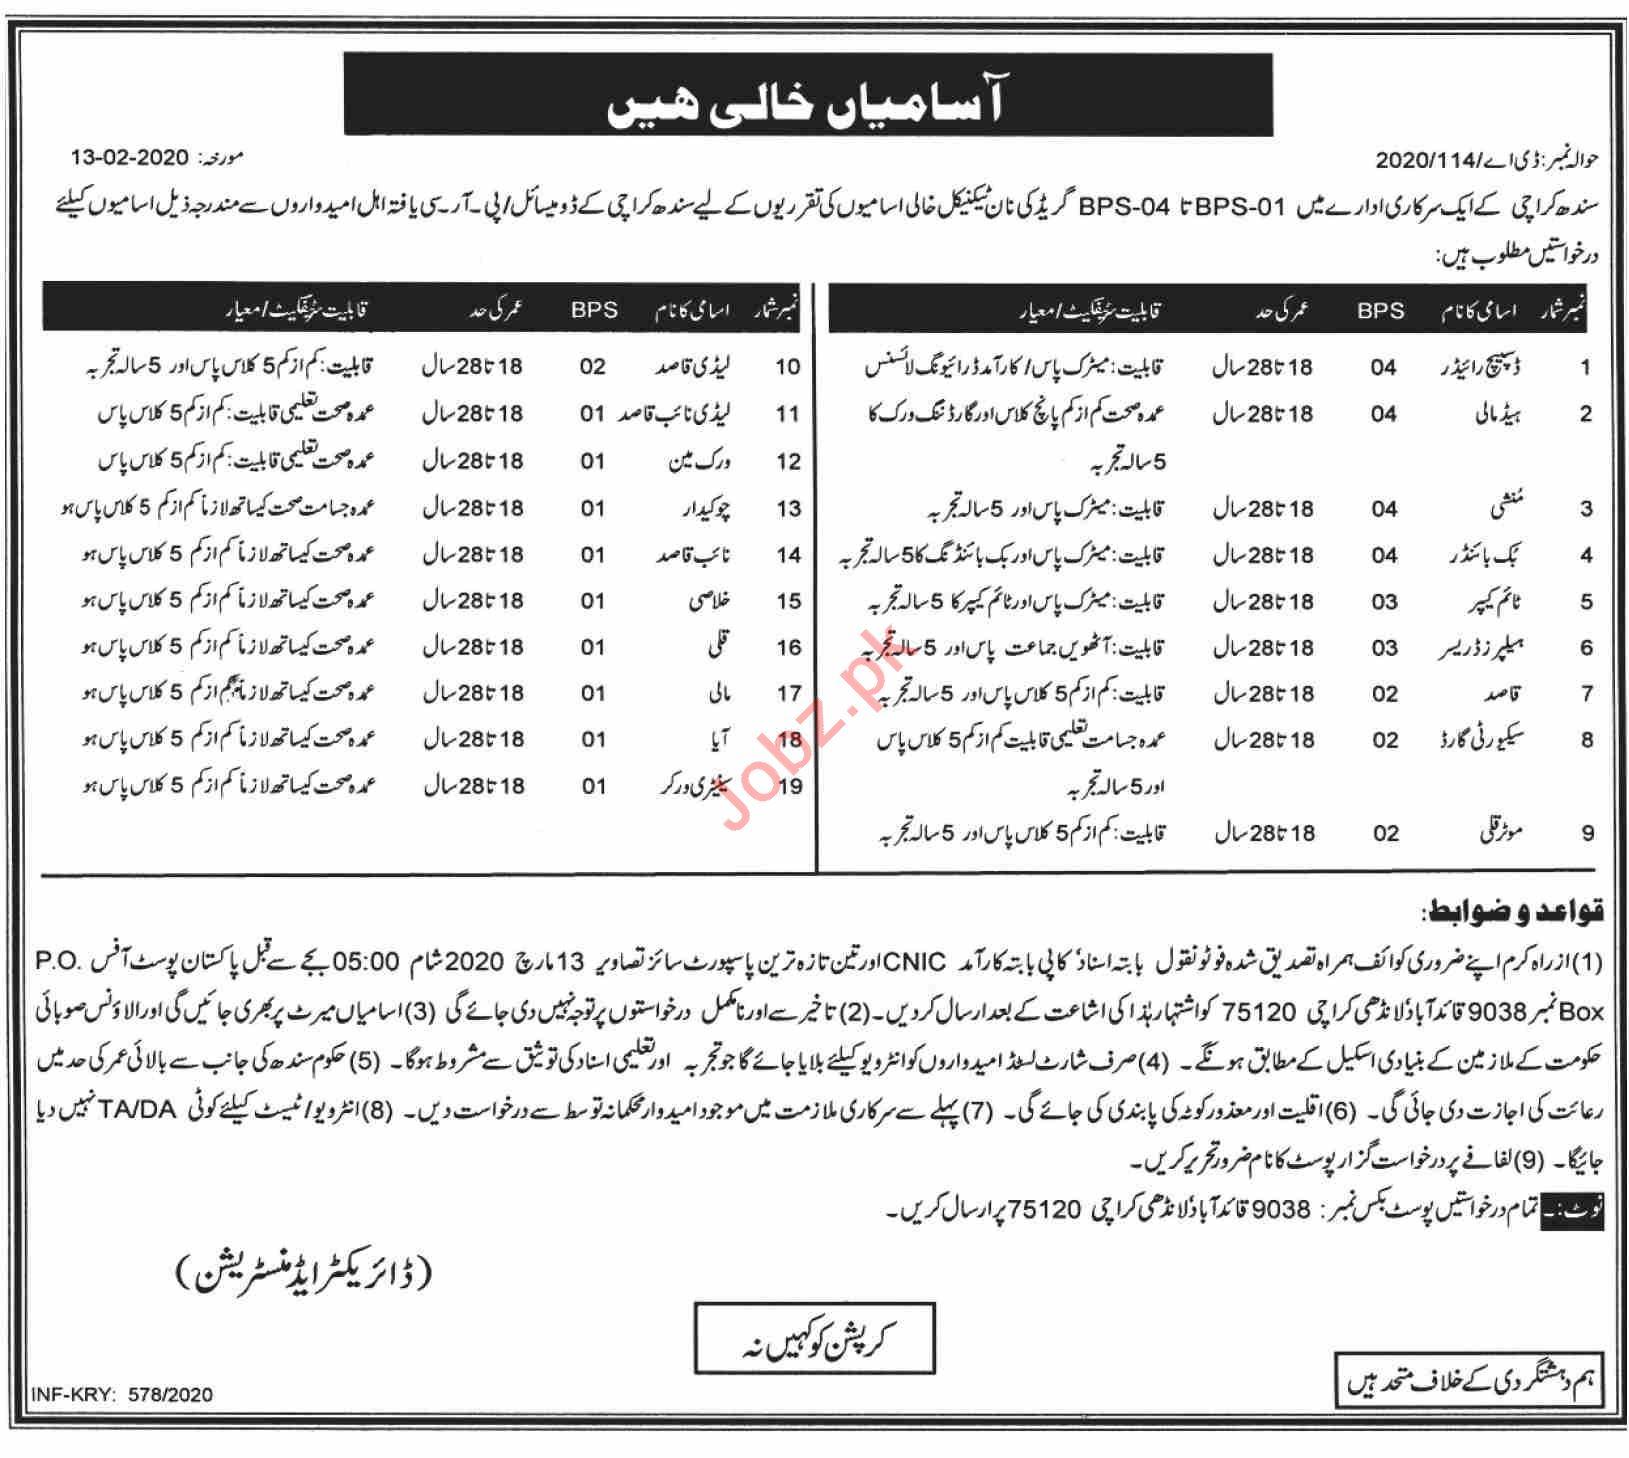 Public Sector Organization Karachi Jobs 2020 BPS 1 to BPS 4